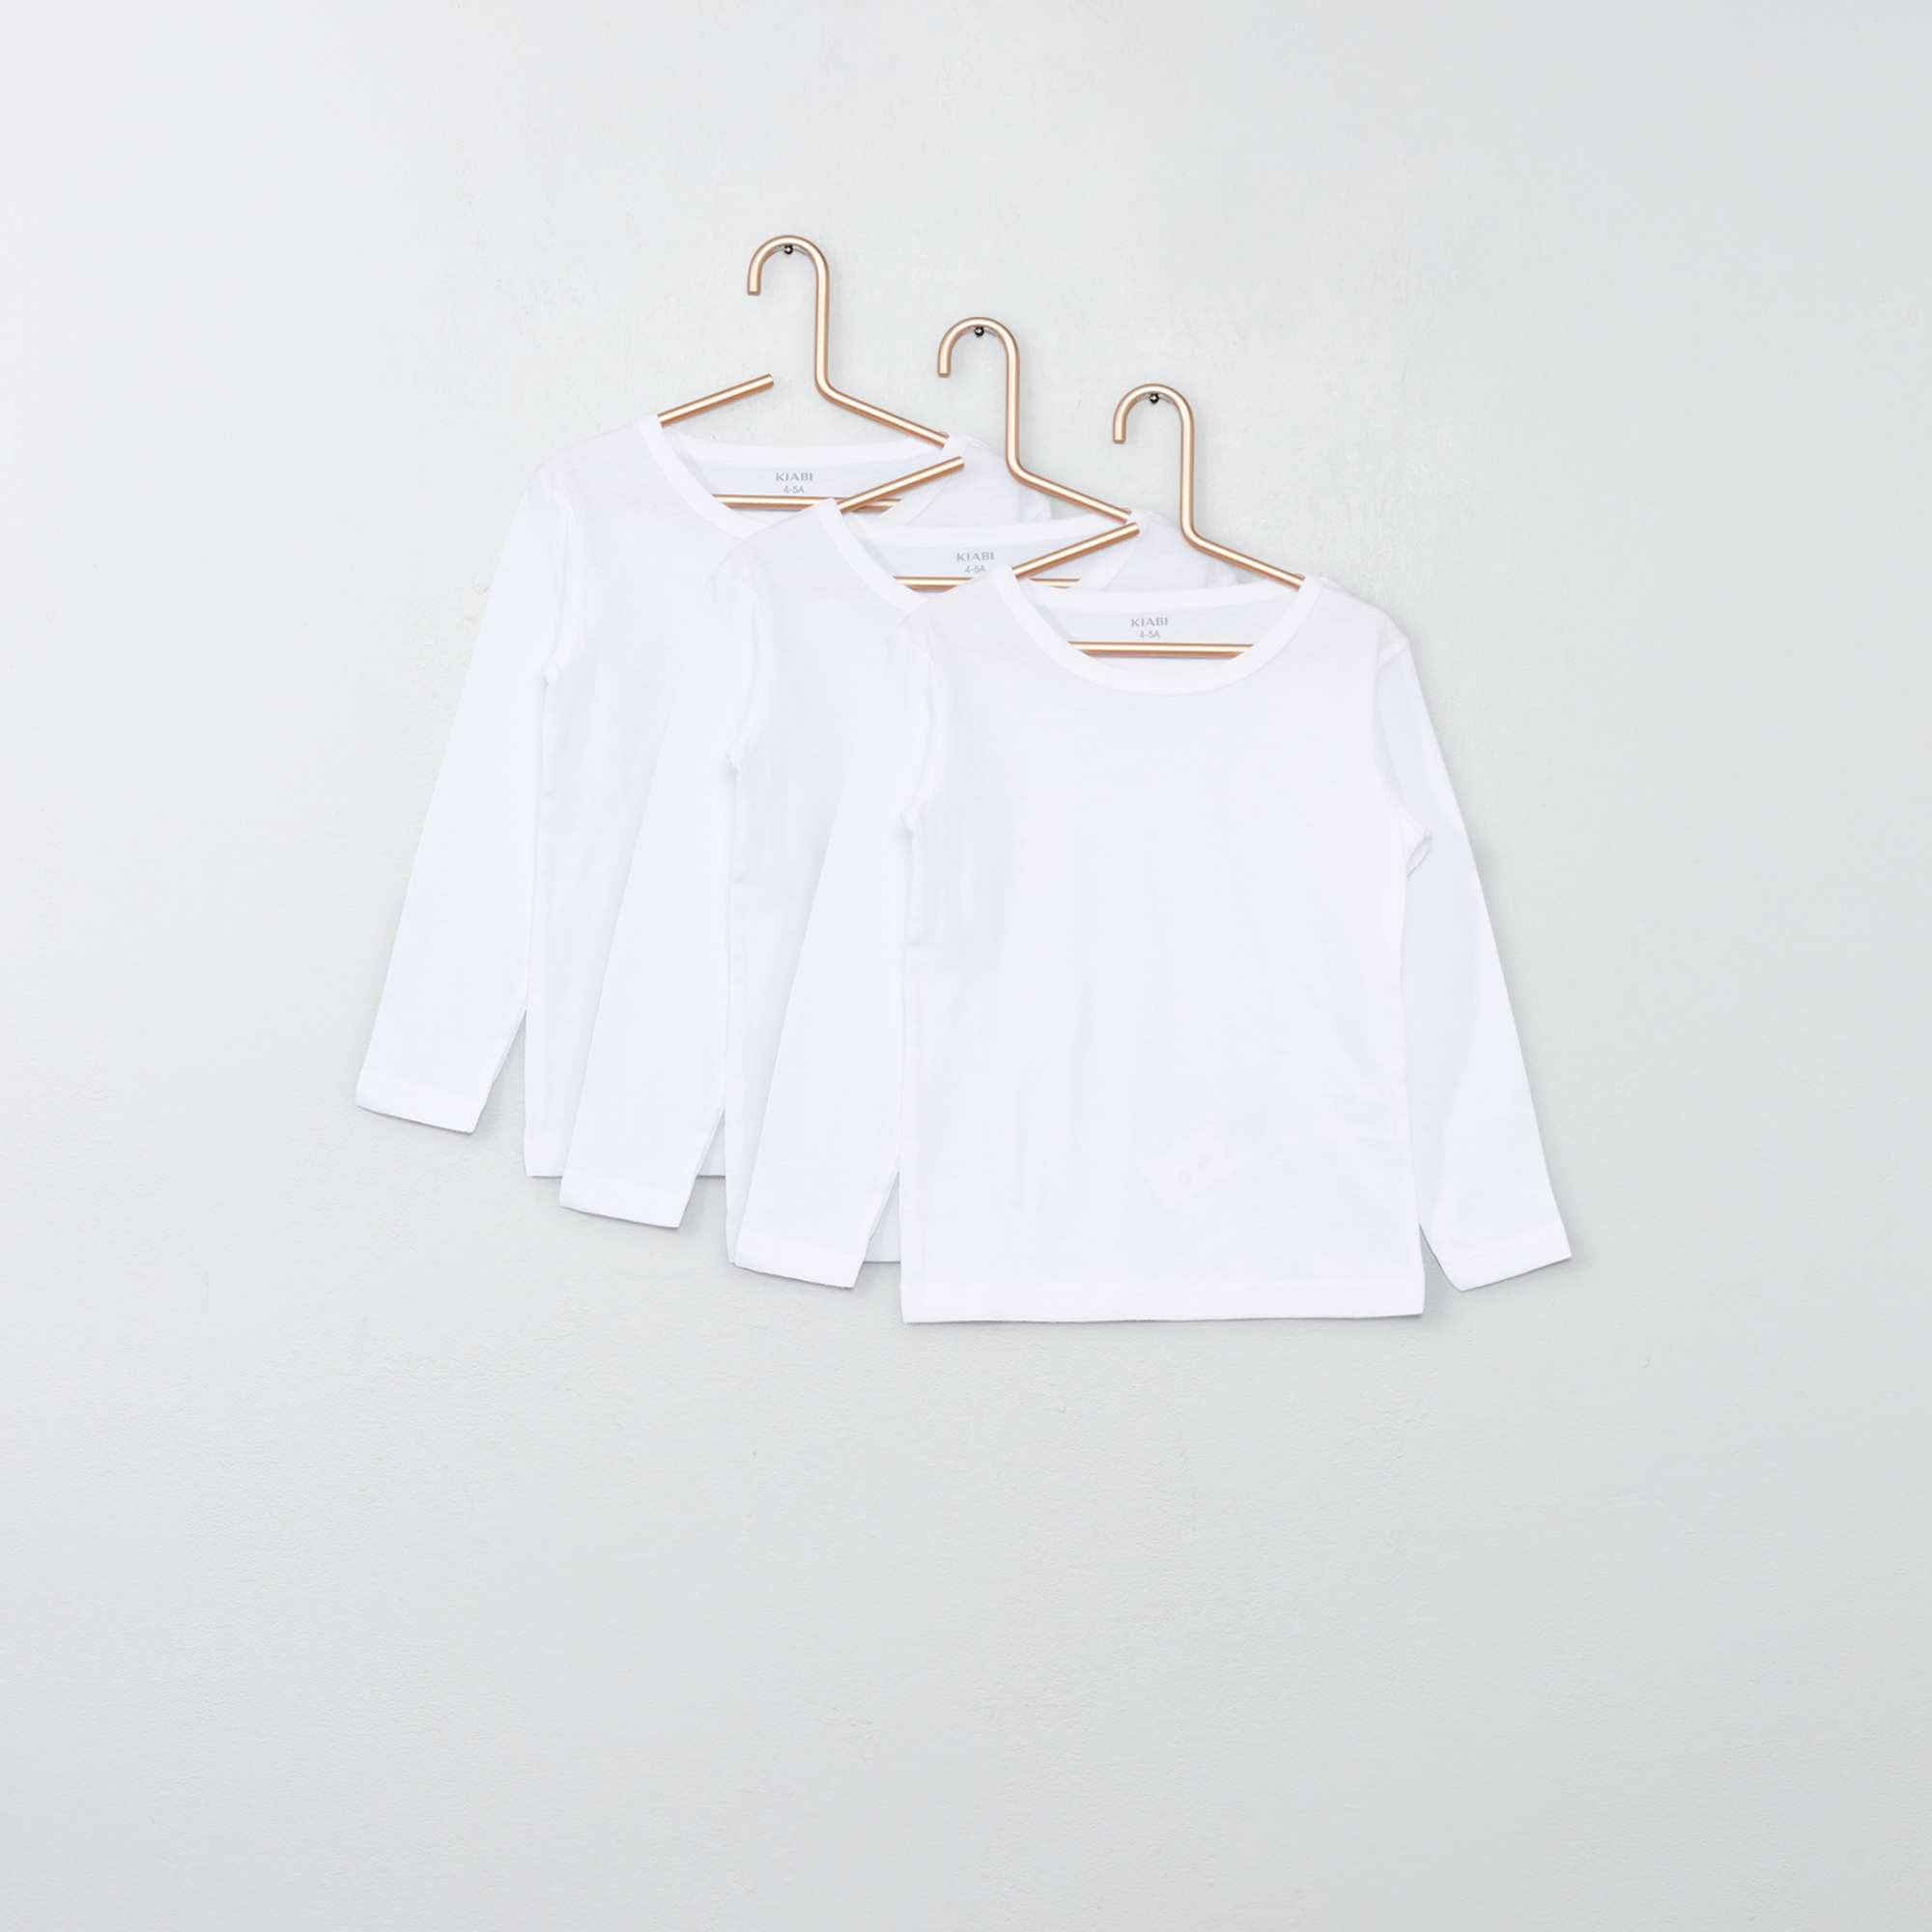 1c4055c37da Pack de 3 camisetas de manga larga de algodón Chica - blanco - Kiabi ...